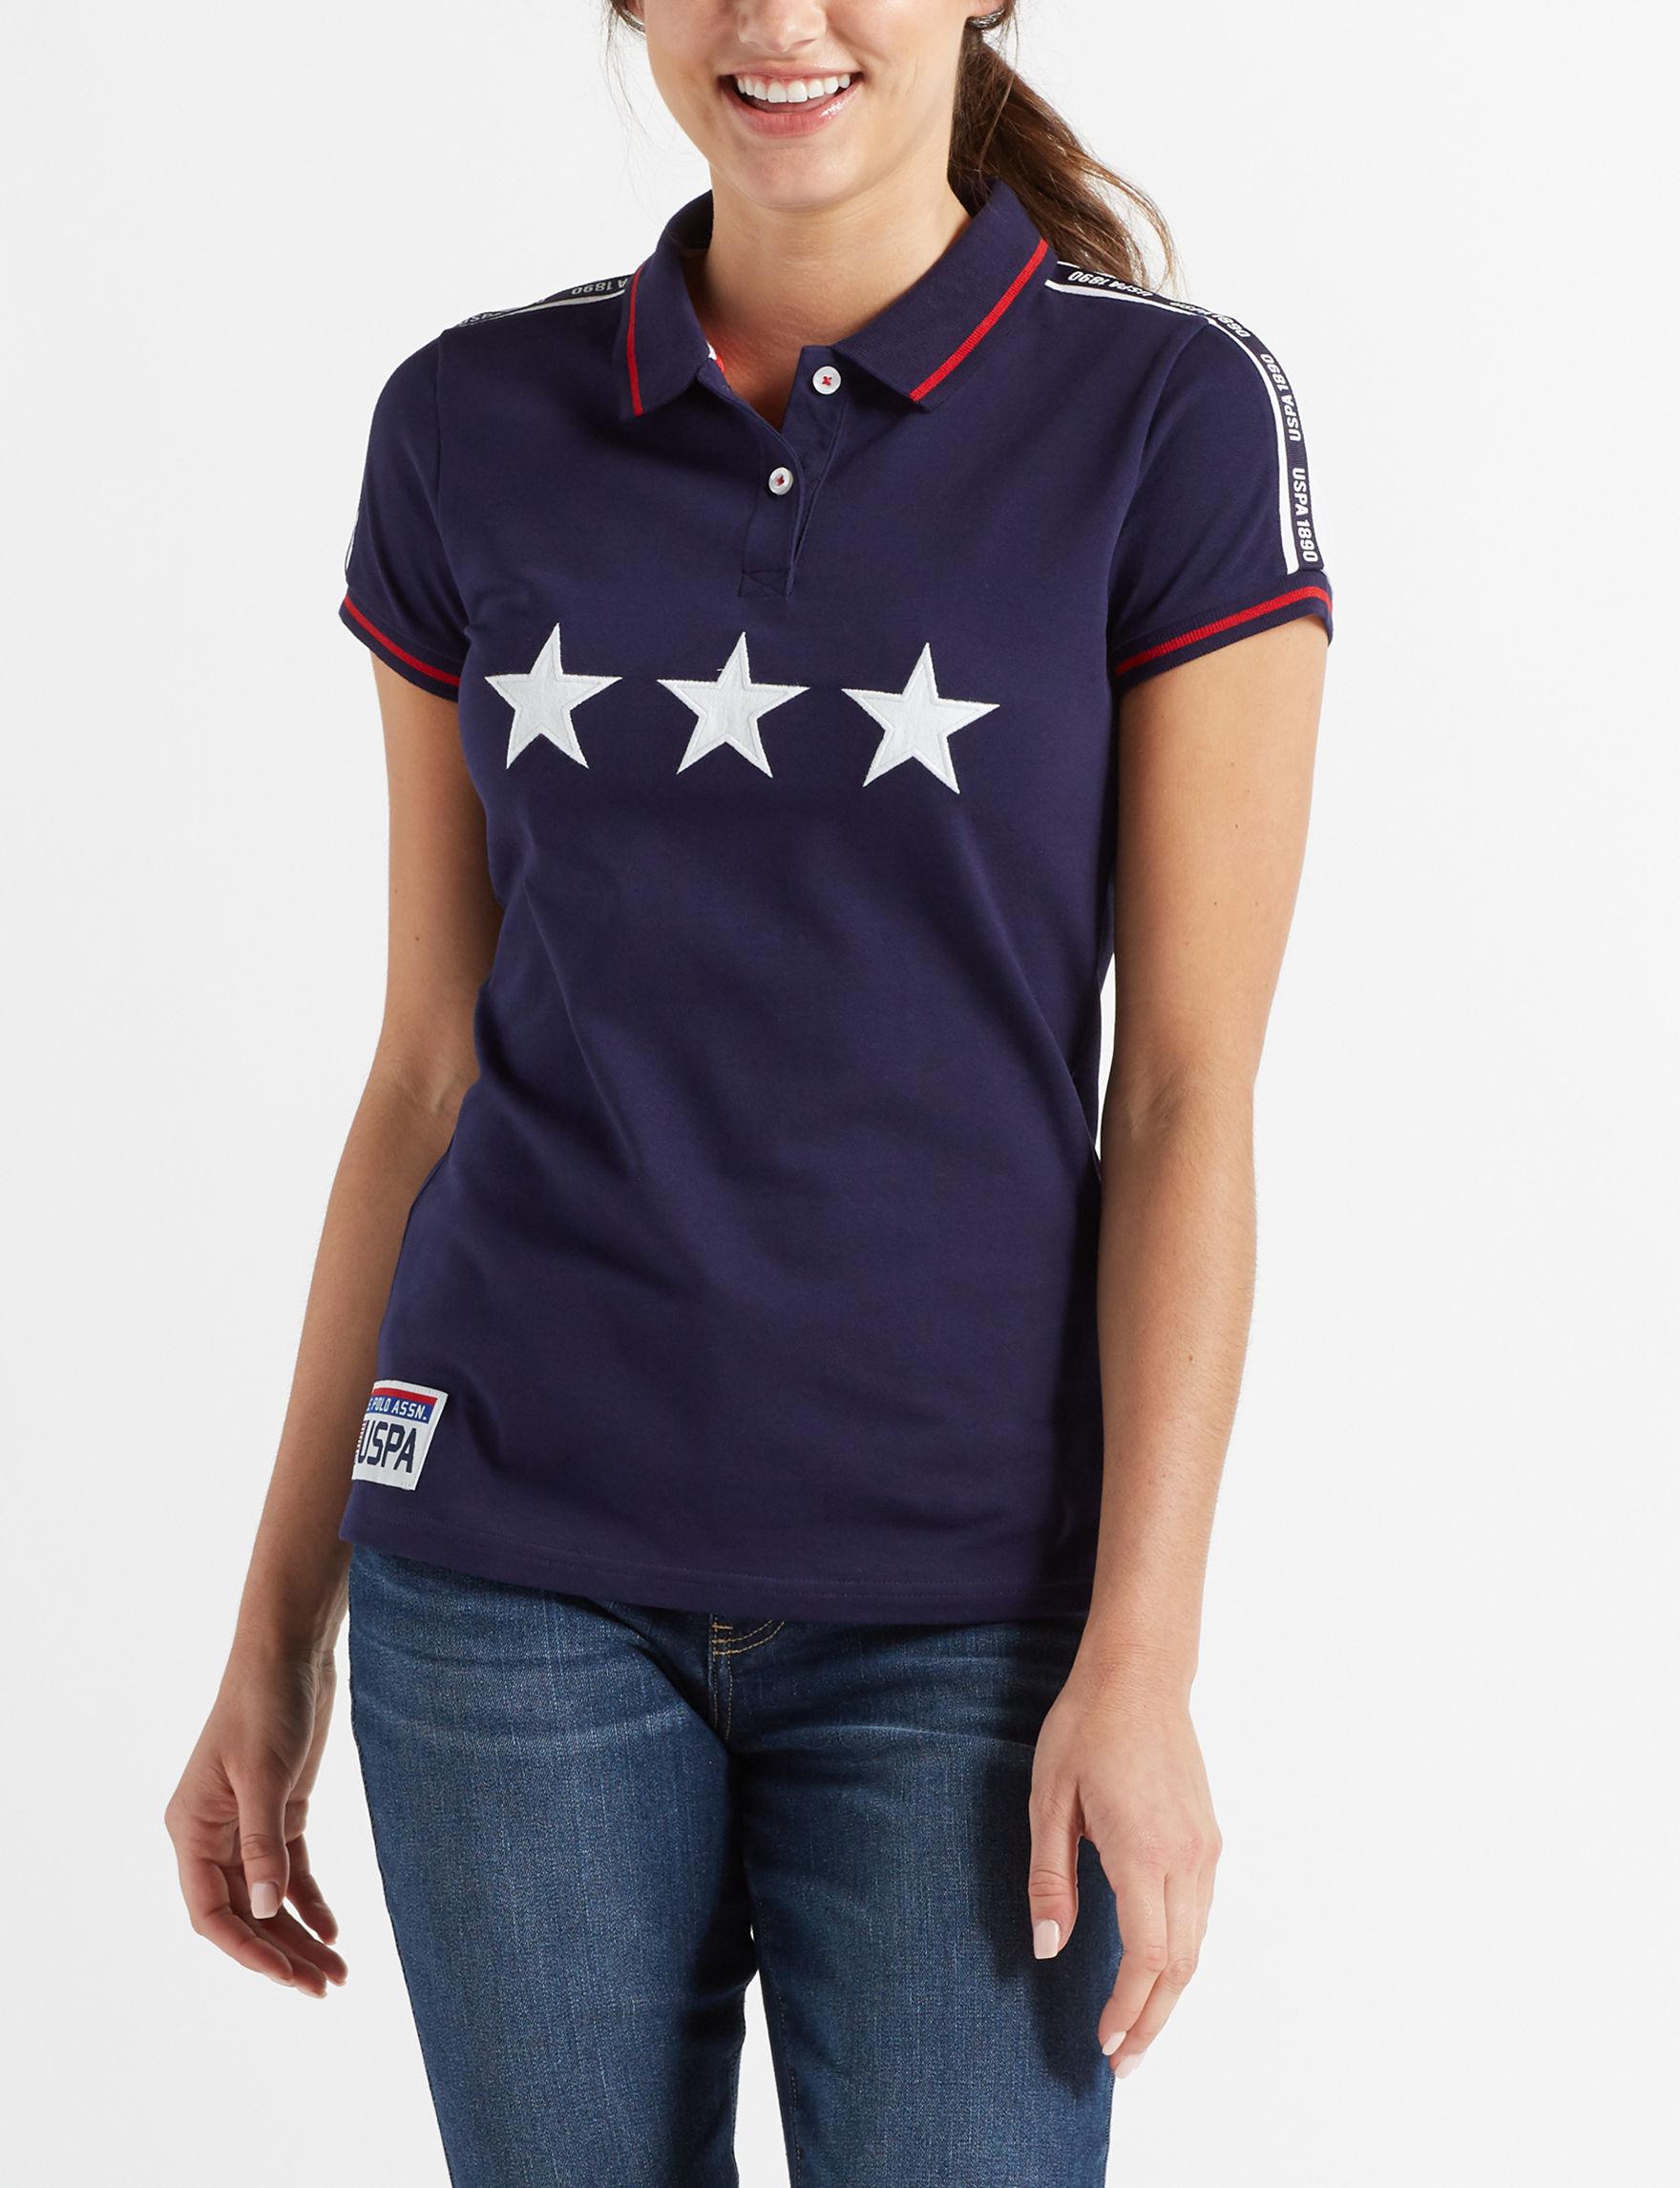 U.S. Polo Assn. Blue / White / Red Polos